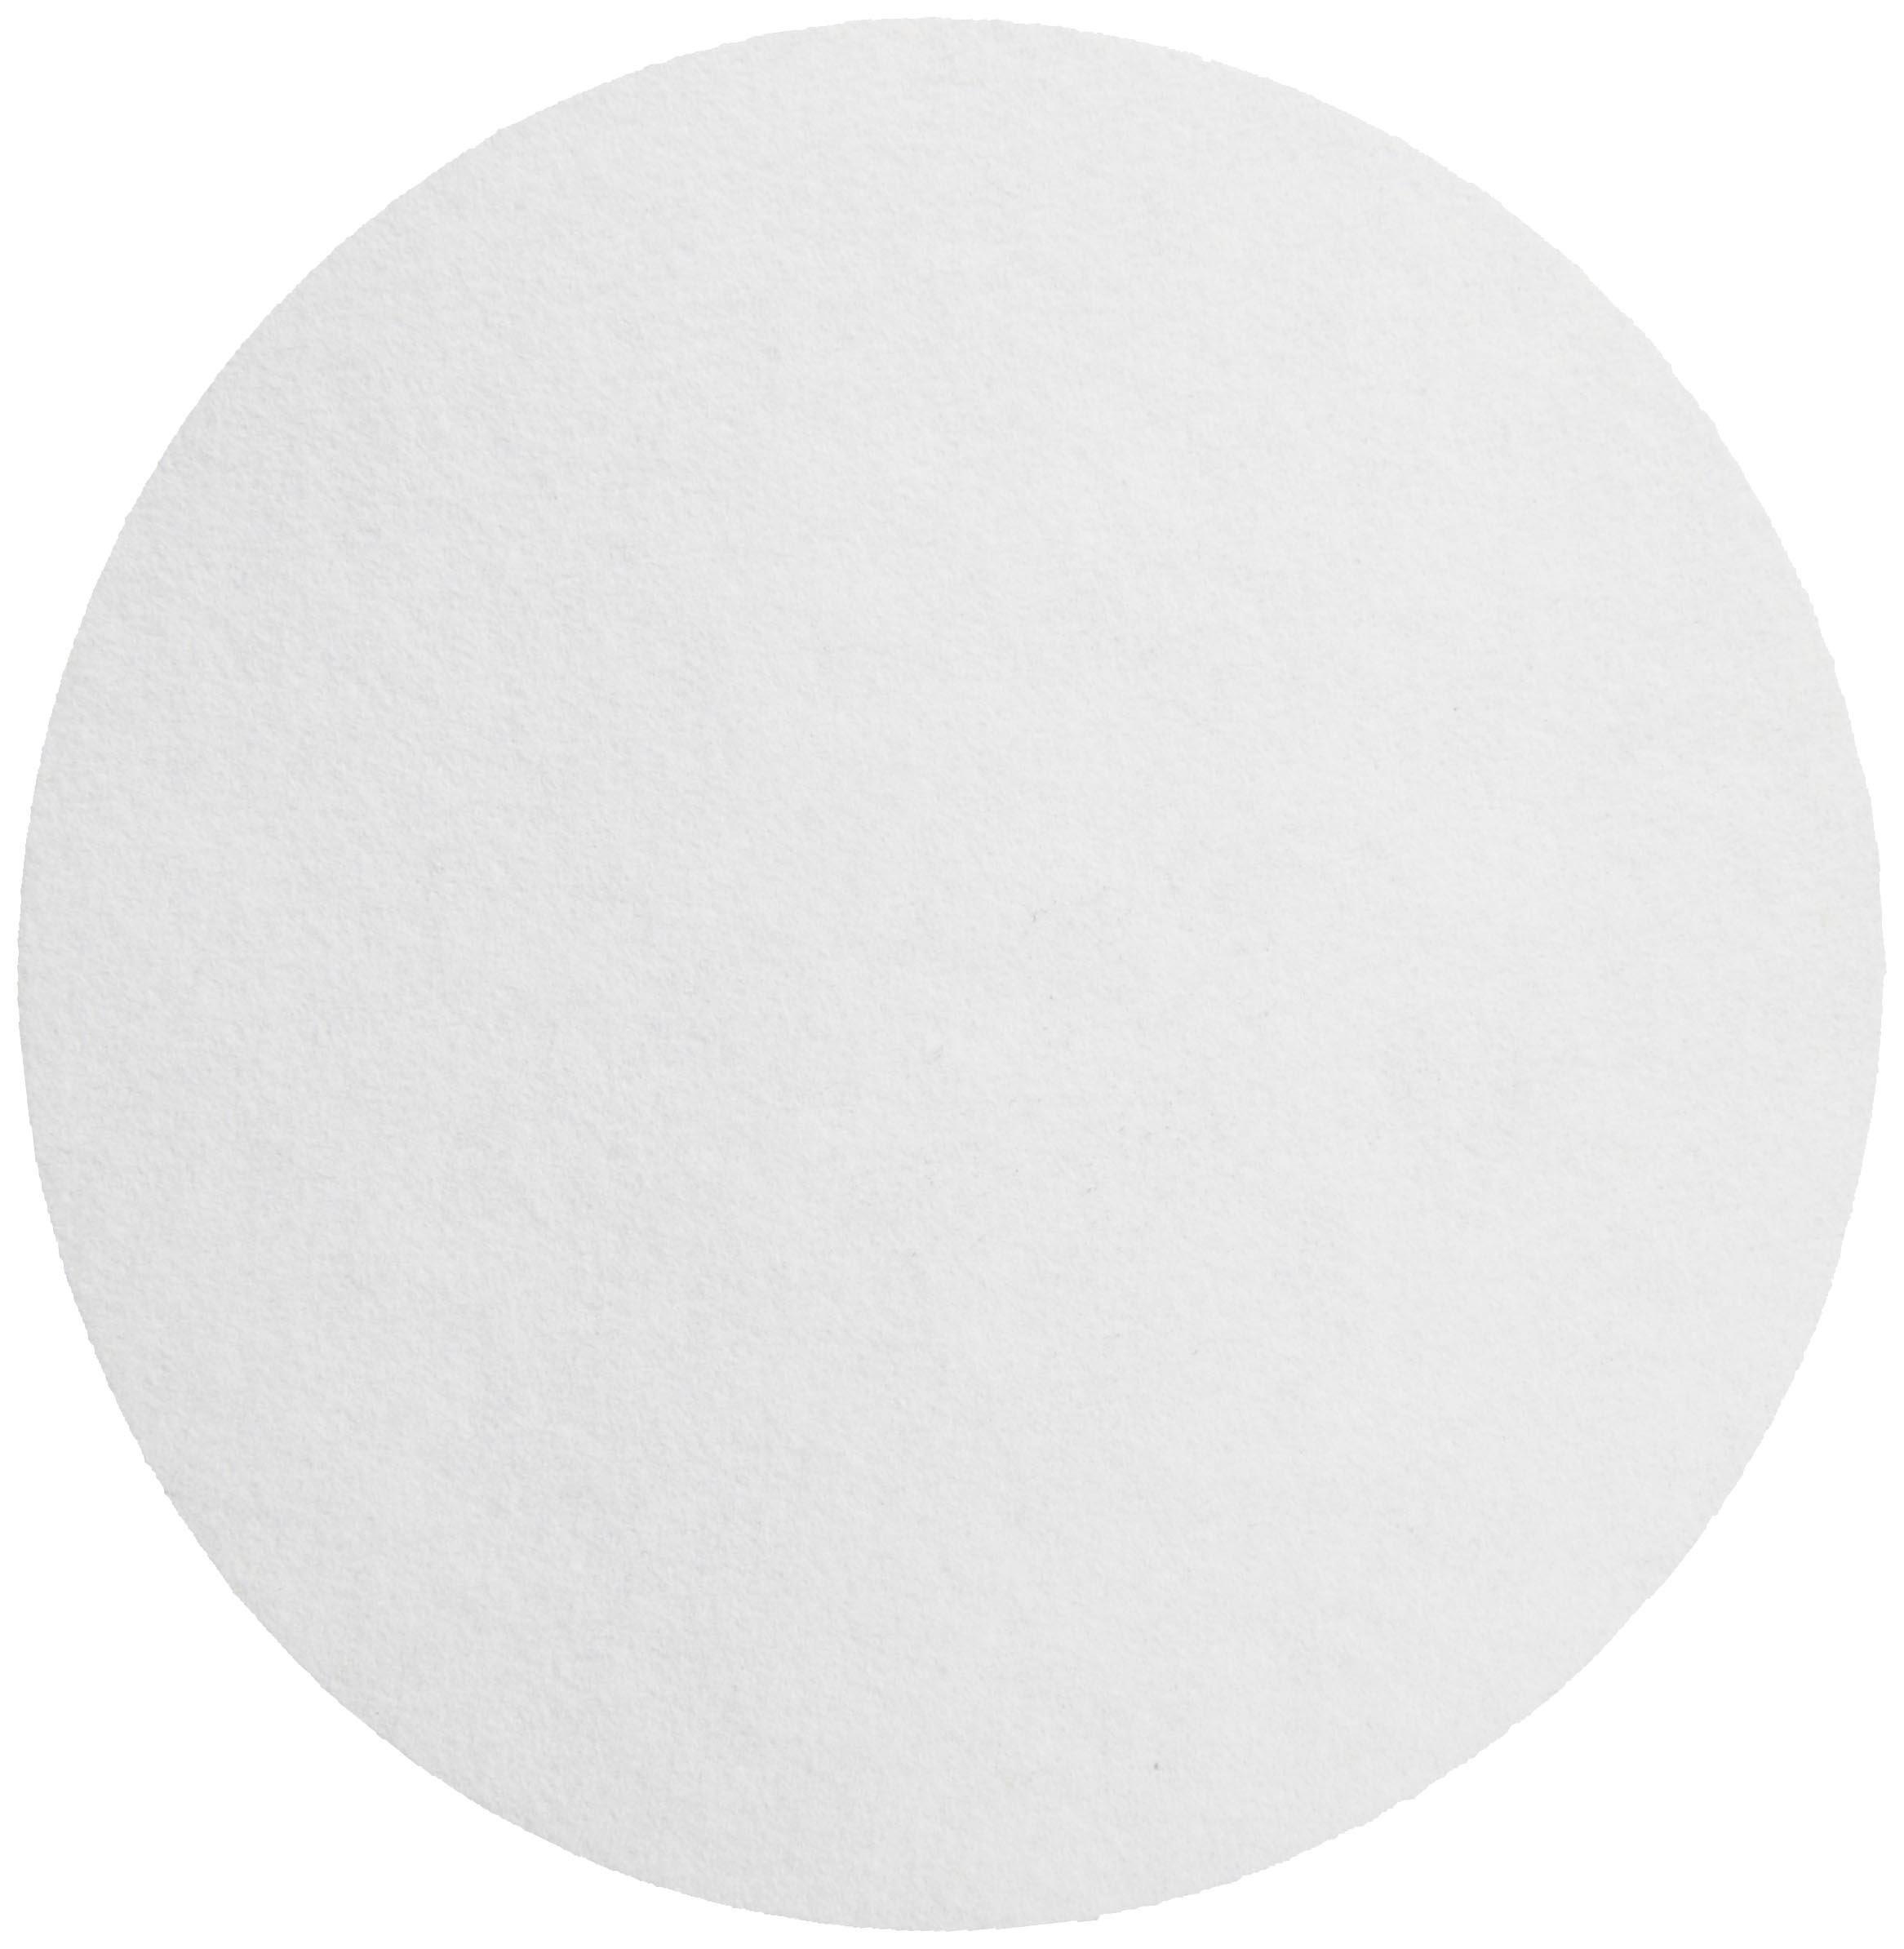 Whatman 1441-042 Ashless Quantitative Filter Paper, 4.25cm Diameter, 20 Micron, Grade 41 (Pack of 100) by Whatman